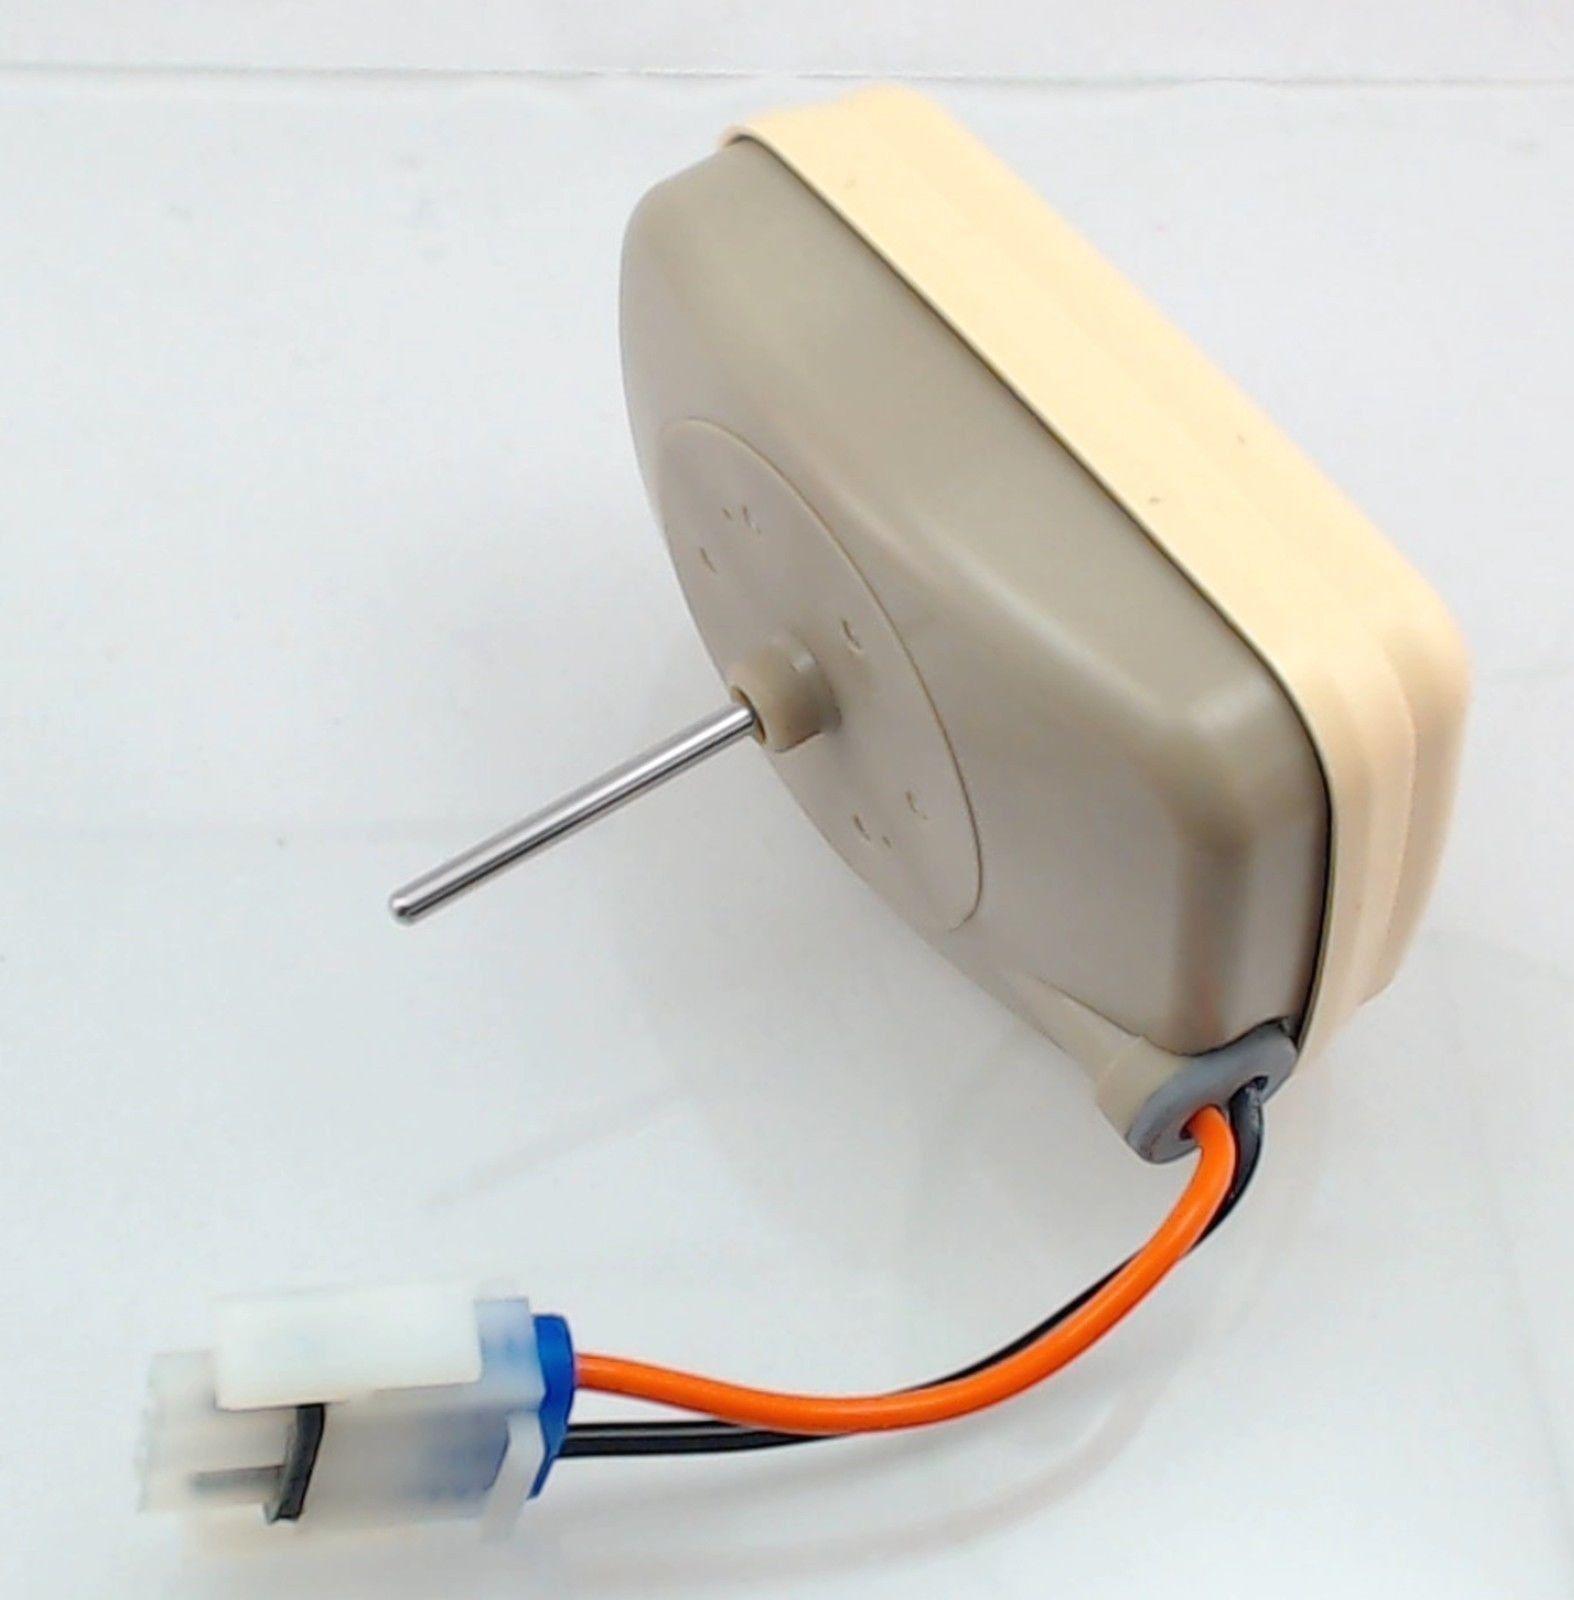 Evaporator fan motor for general electric ap3798650 for General electric fan motor